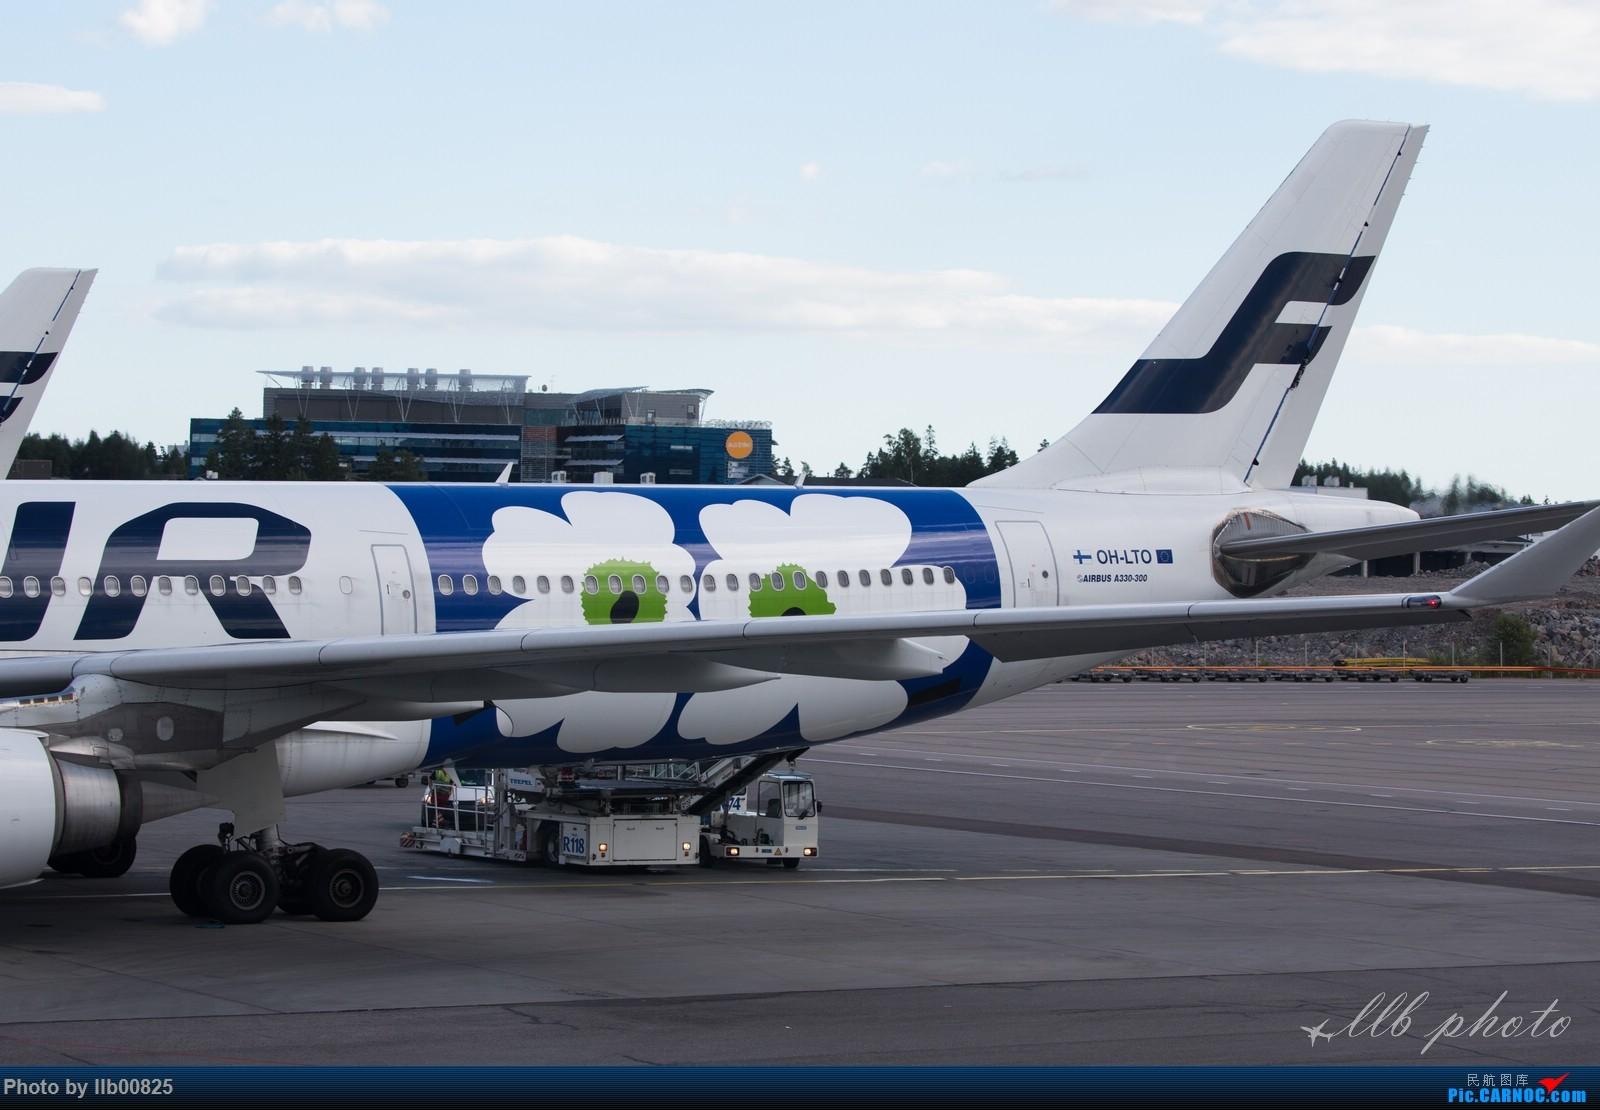 Re:[原创]赫尔辛基-布鲁塞尔一些杂图 AIRBUS A330-300 OH-LTO 芬兰赫尔辛基机场